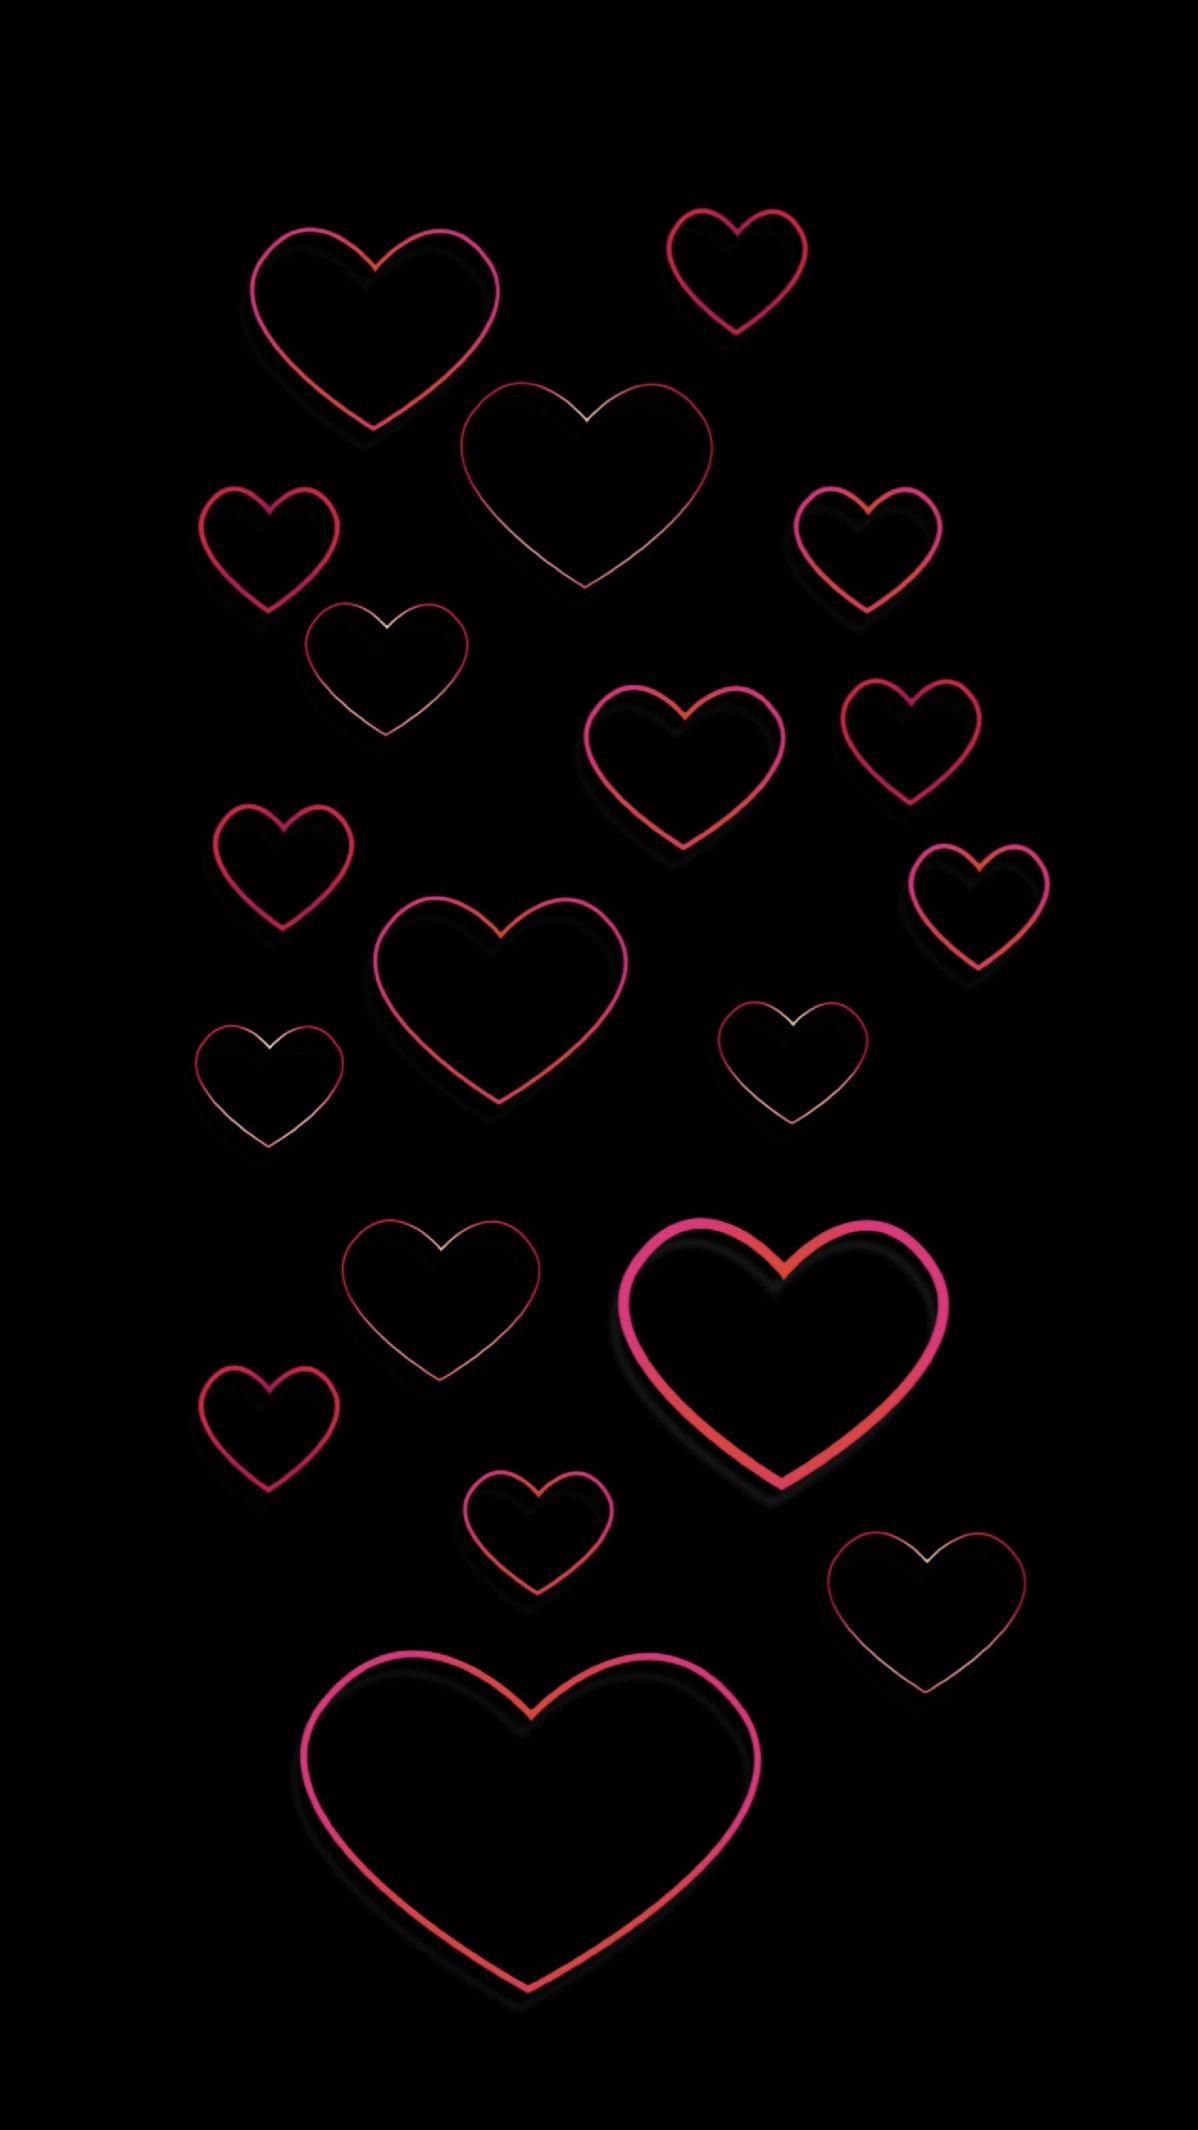 Pin By Nancy Waller On Iphone Wallpapers Heart Wallpaper Neon